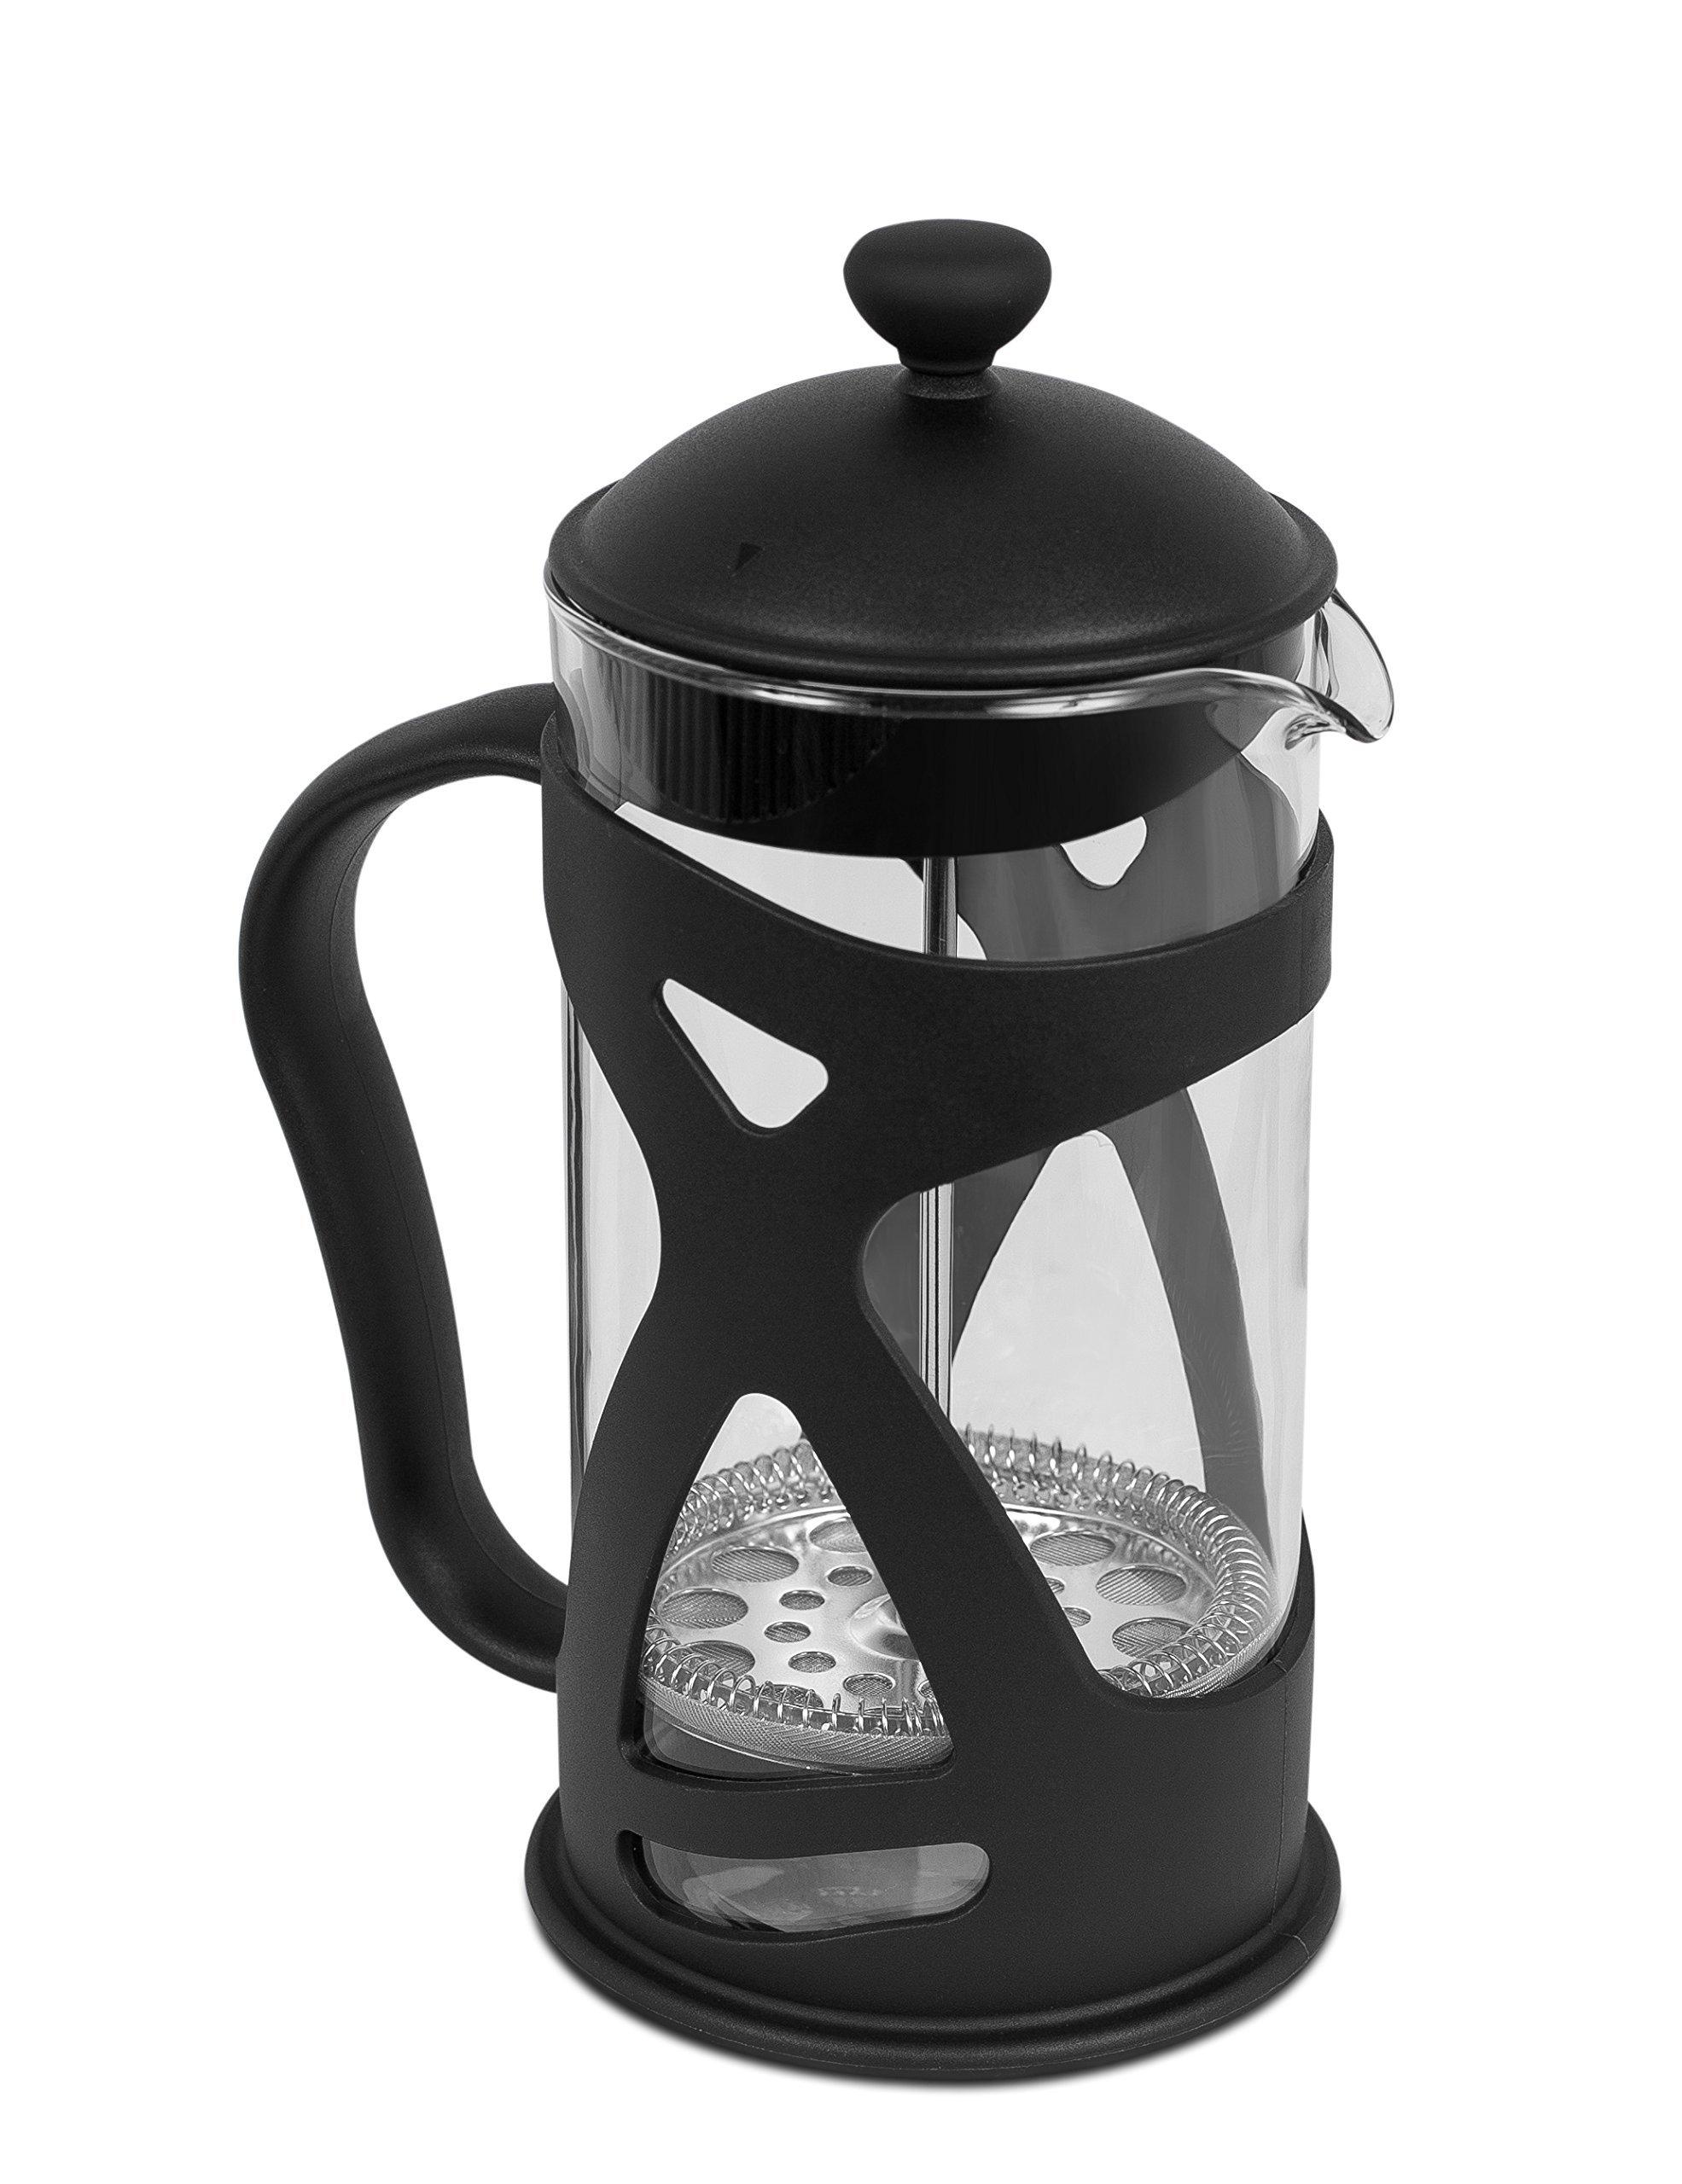 Internet's Best French Press | 1 Liter | 34 Oz | Coffee Maker Glass Body | Black